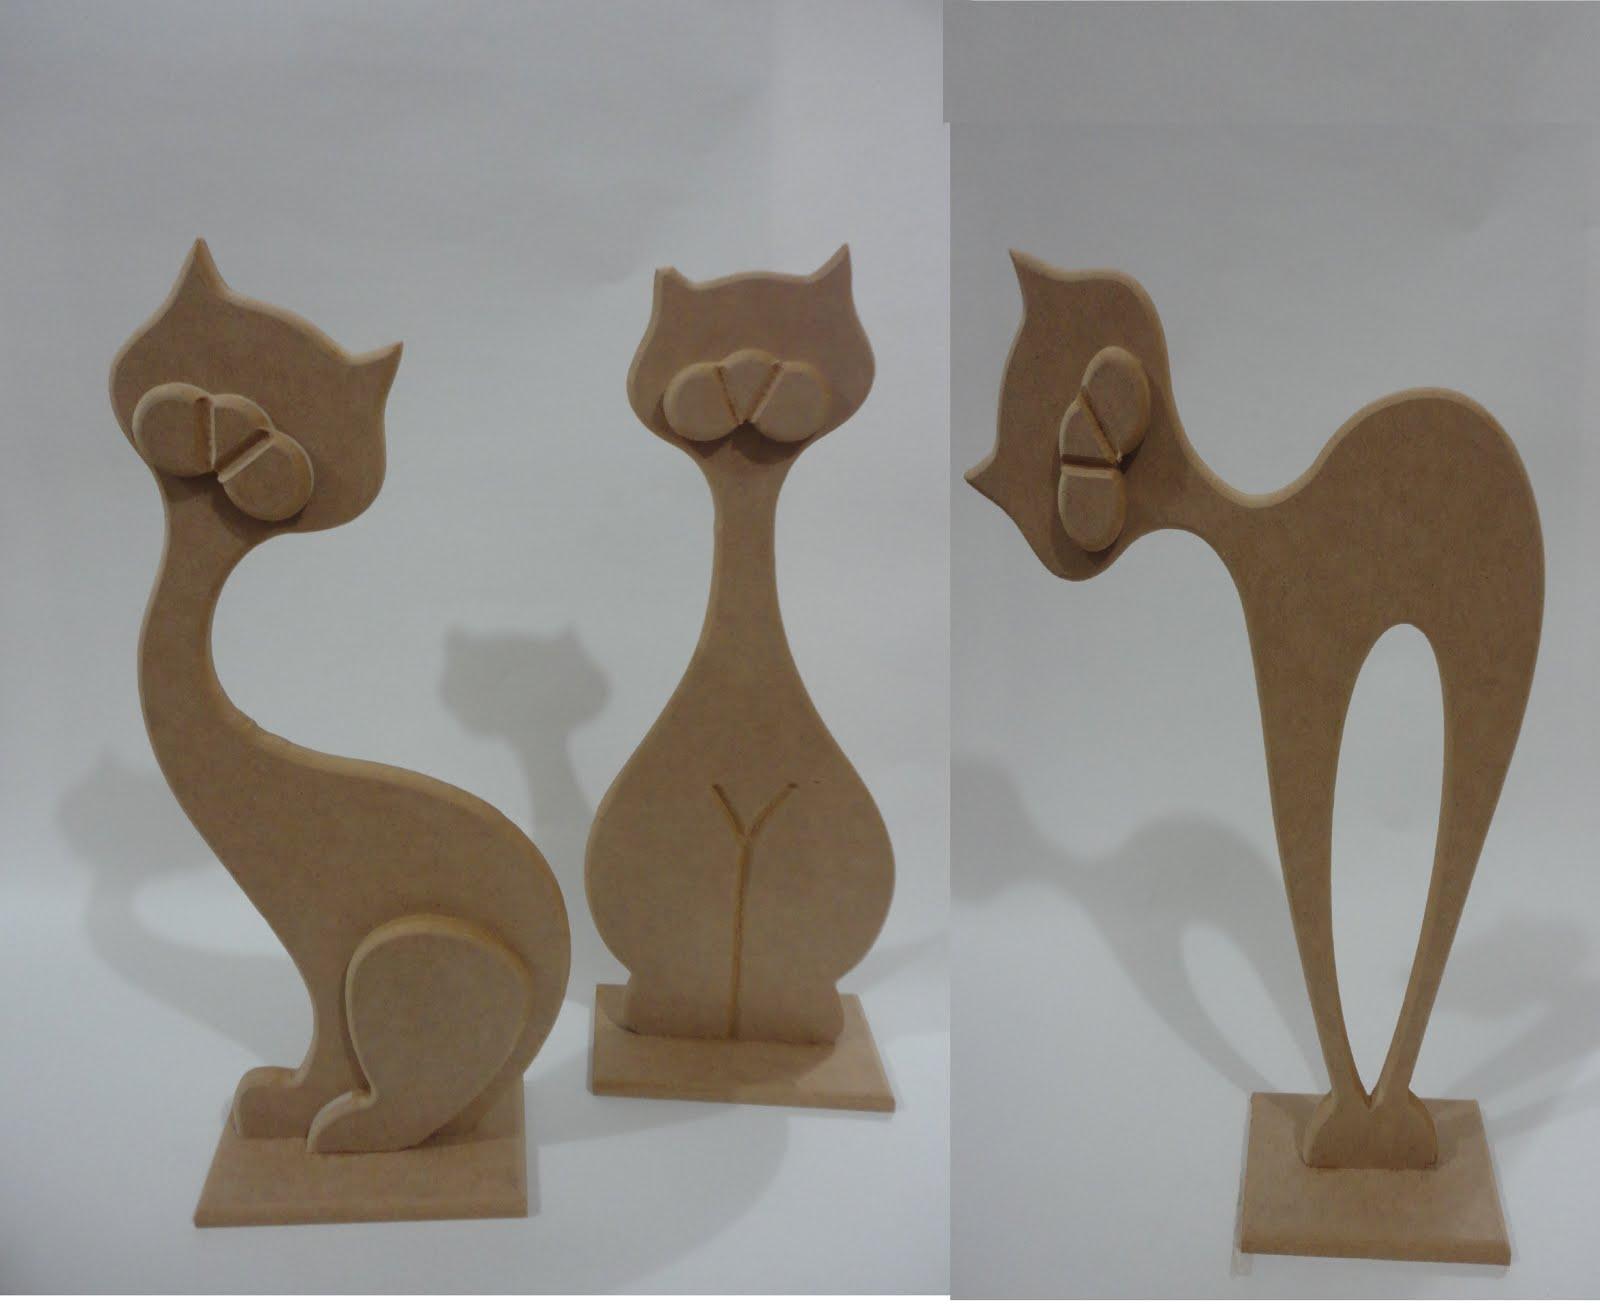 gato # 2 juego x 3